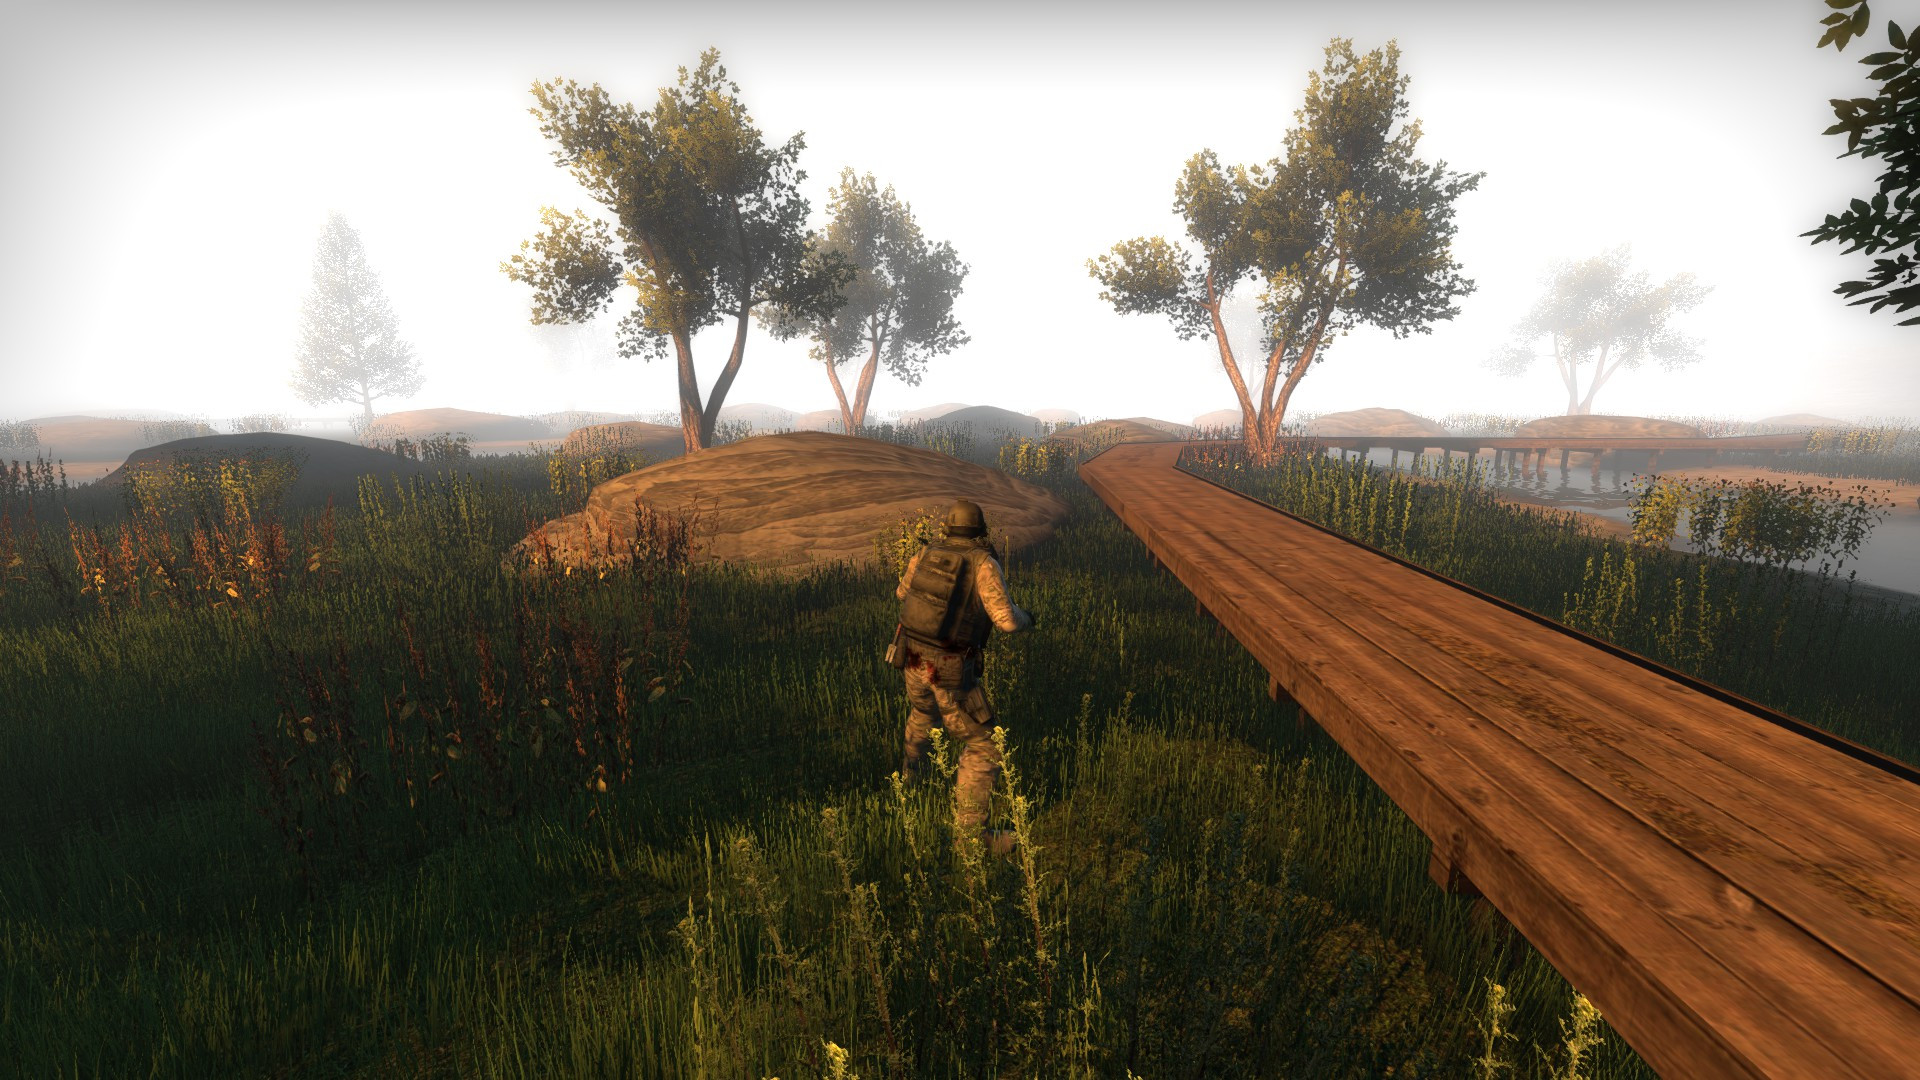 ADB-foliage-pack for CSGO/Source/GMod [Counter-Strike